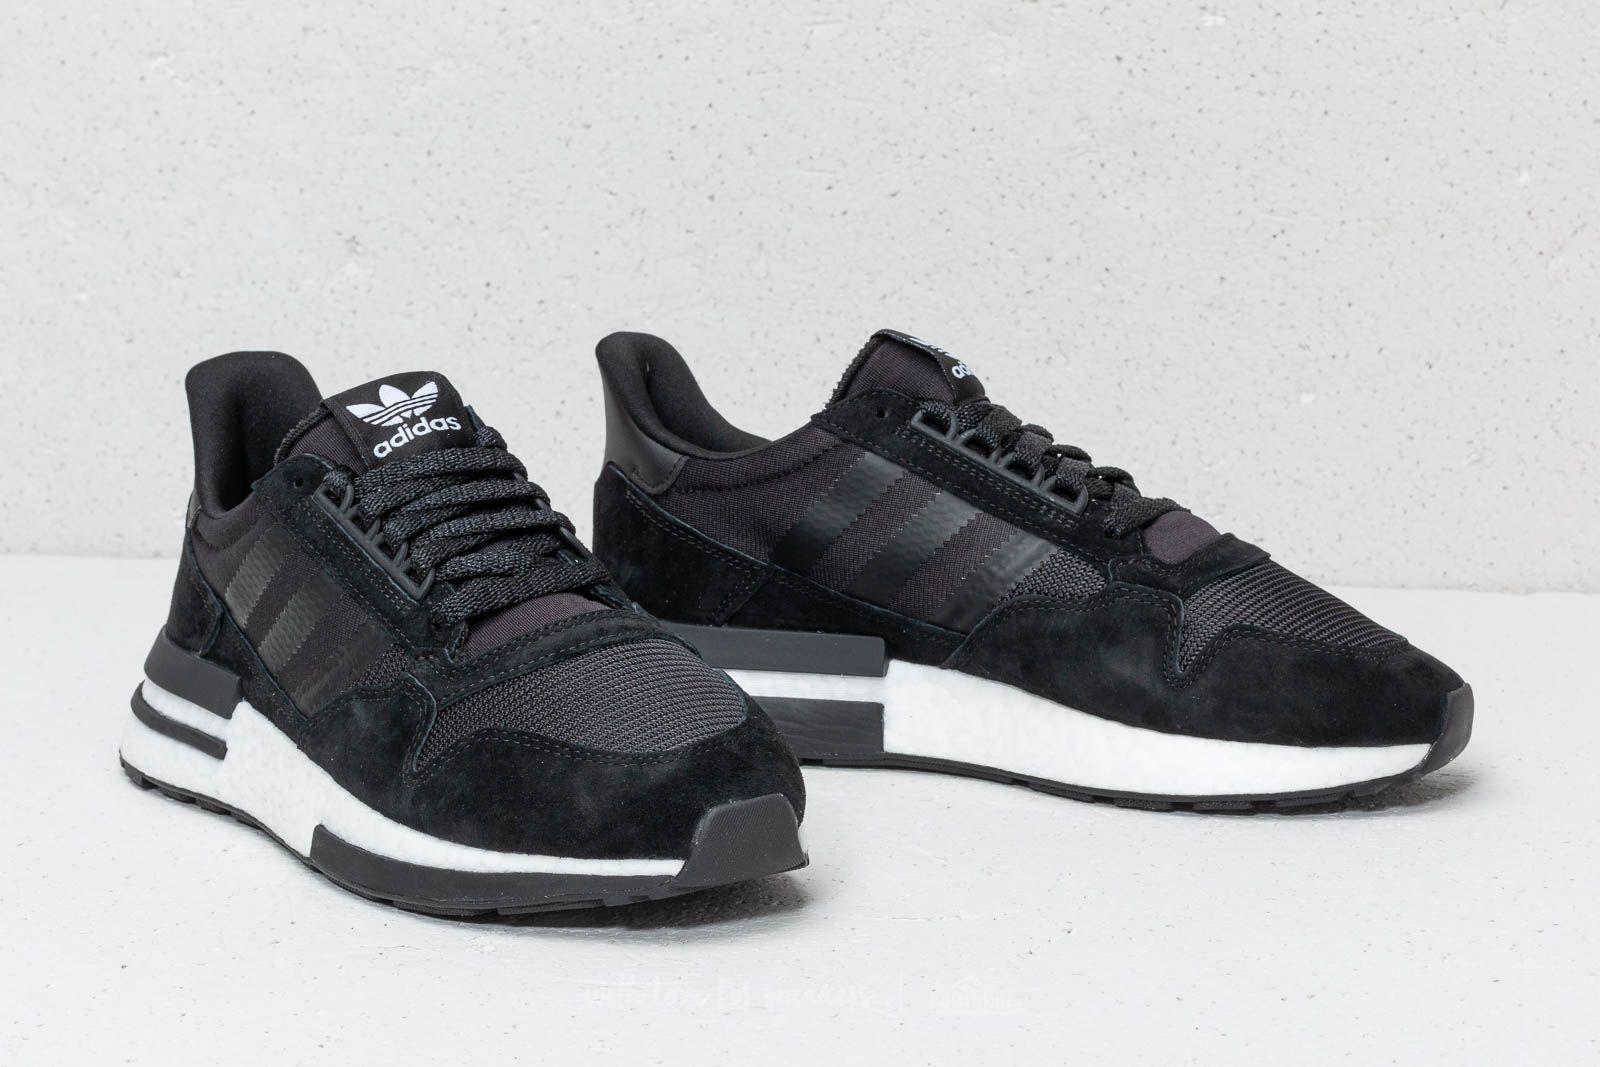 new style a4e90 ad4b6 adidas ZX 500 RM Core Black/ Ftw White/ Core Black | Footshop